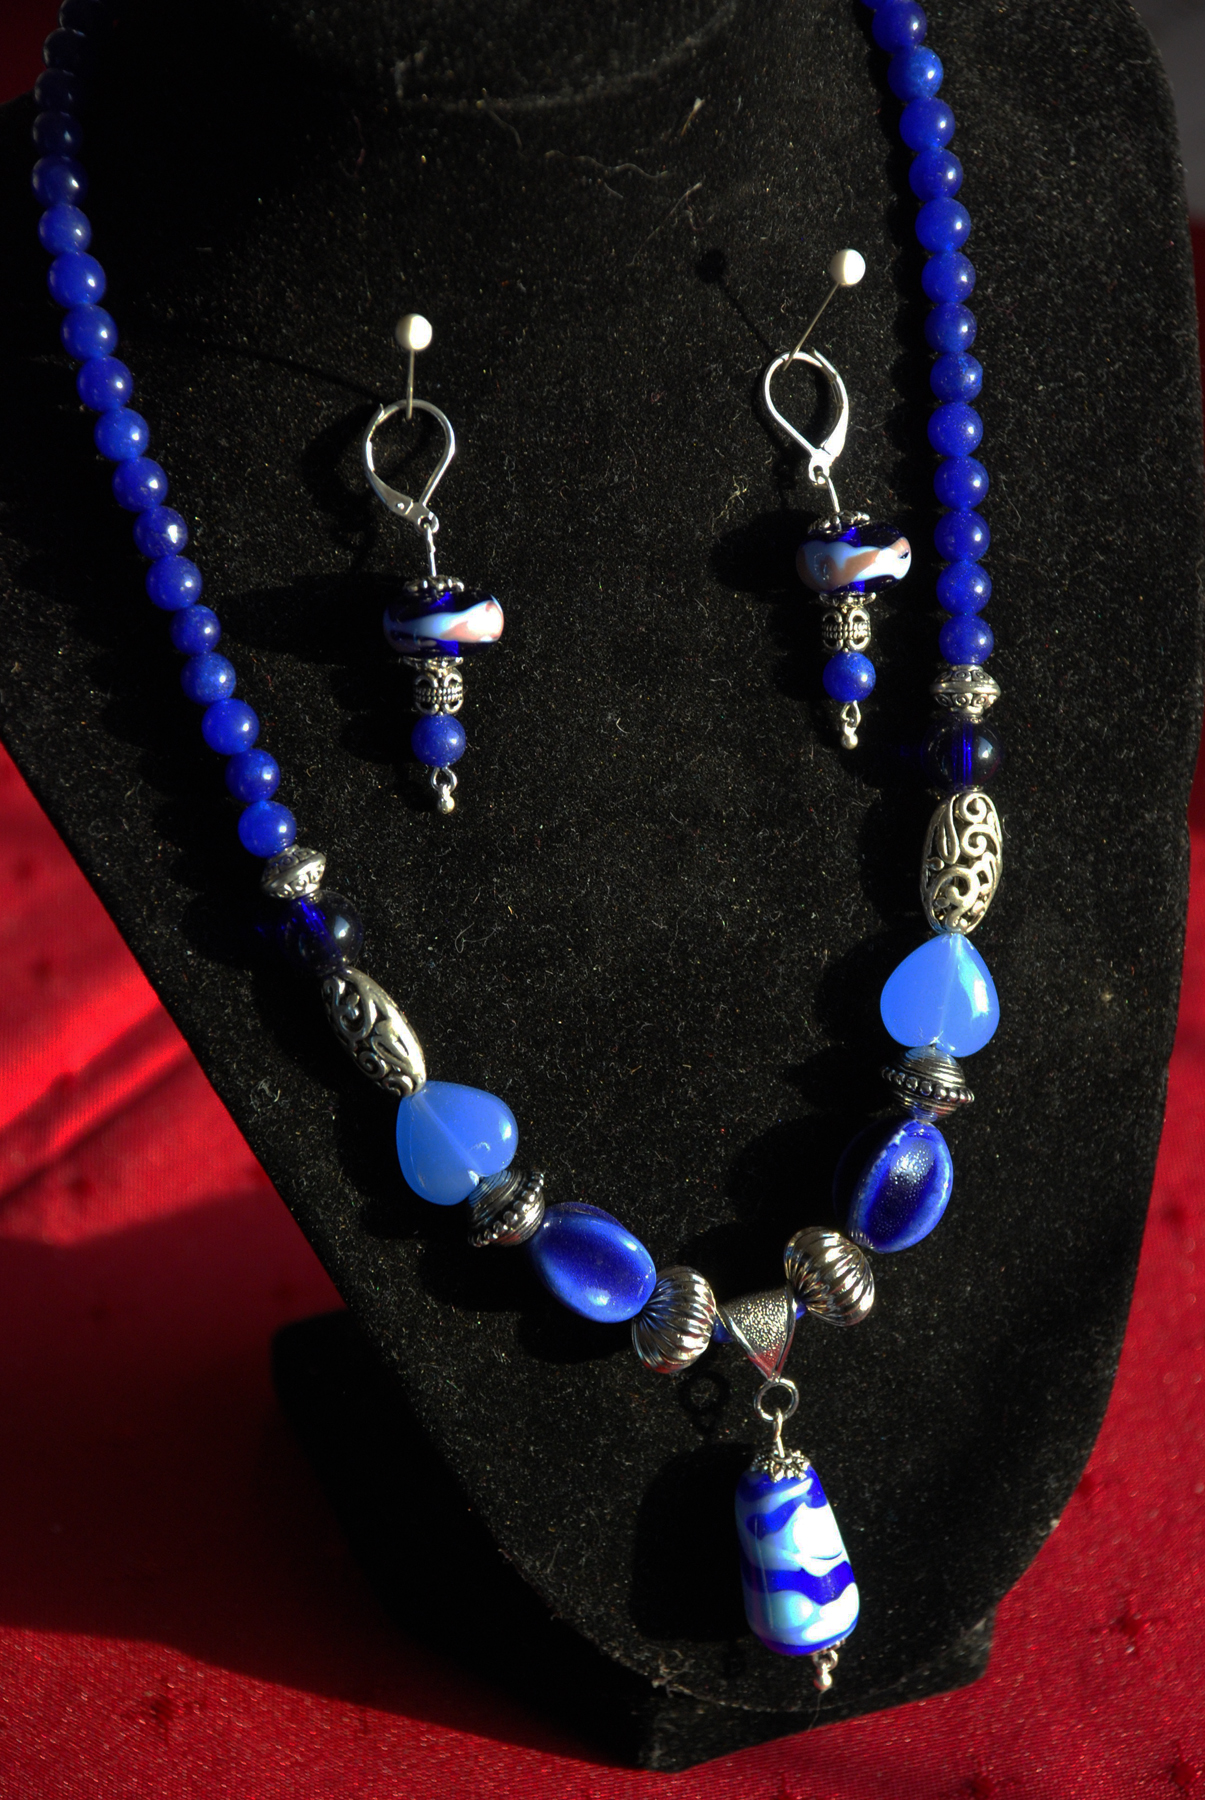 Flamework Pendant and Earrings